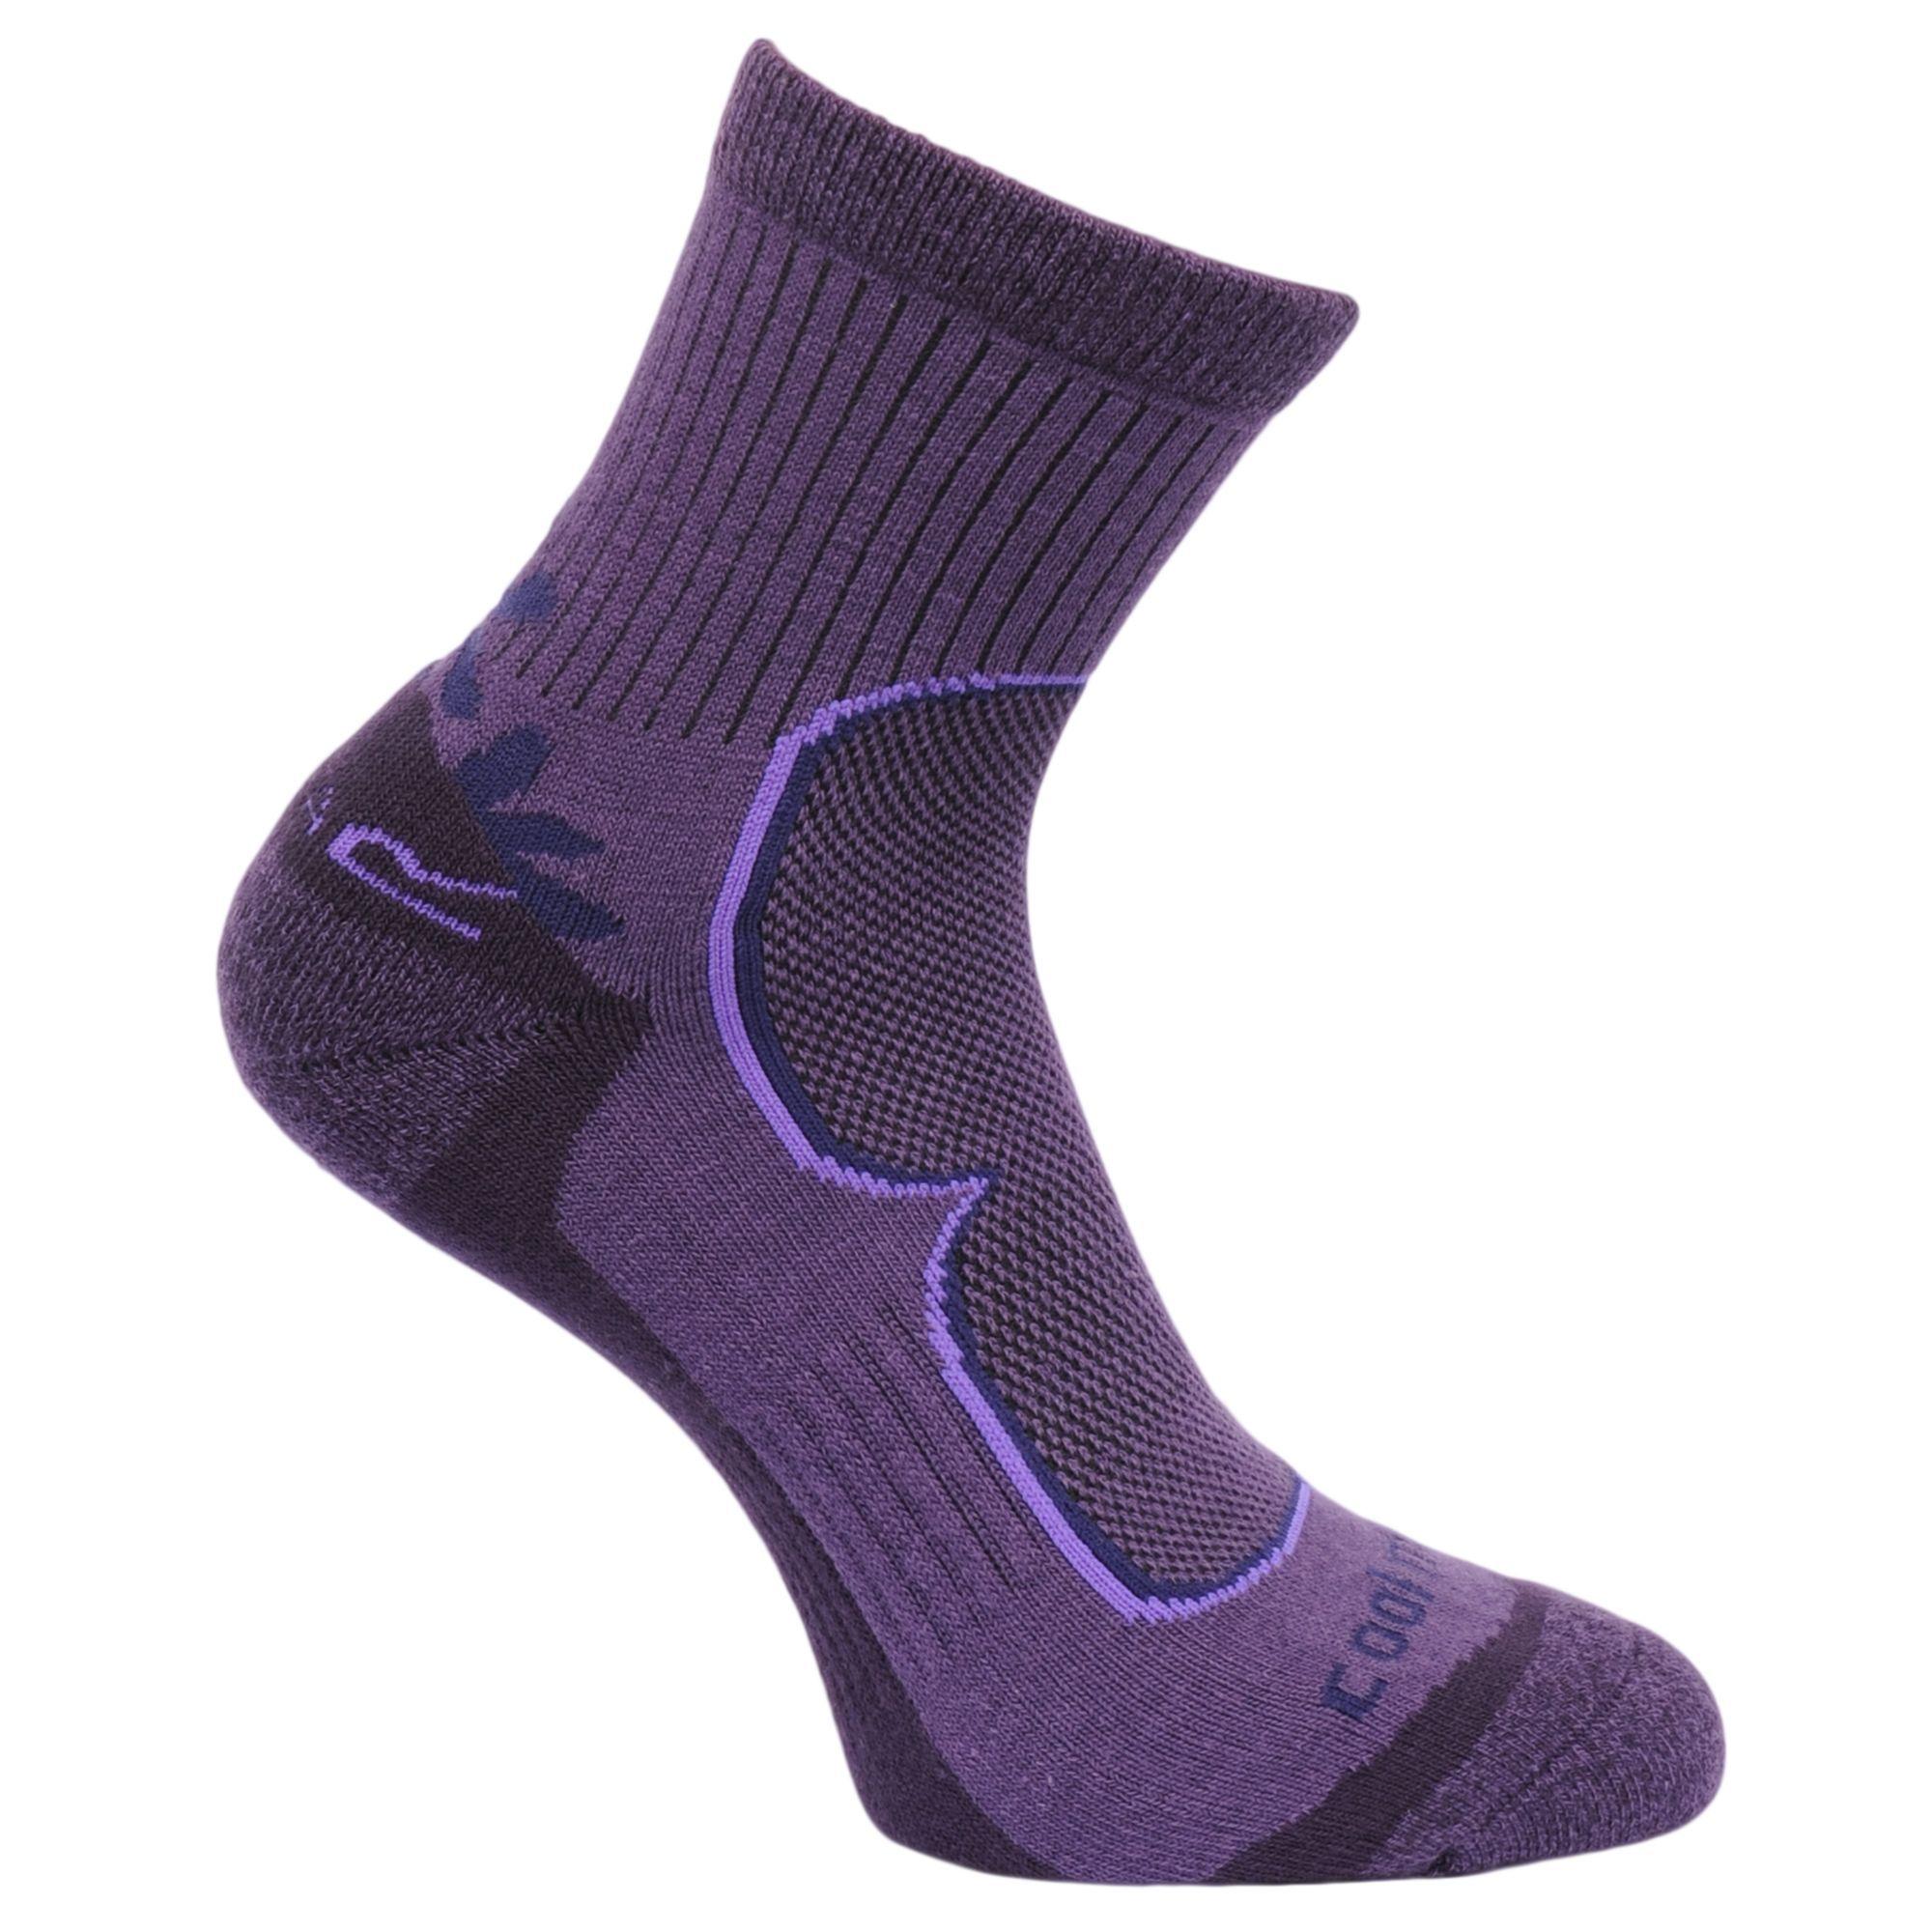 Regatta Great Outdoors Womens/Ladies Active Lifestyle Walking Socks (2 Pack)